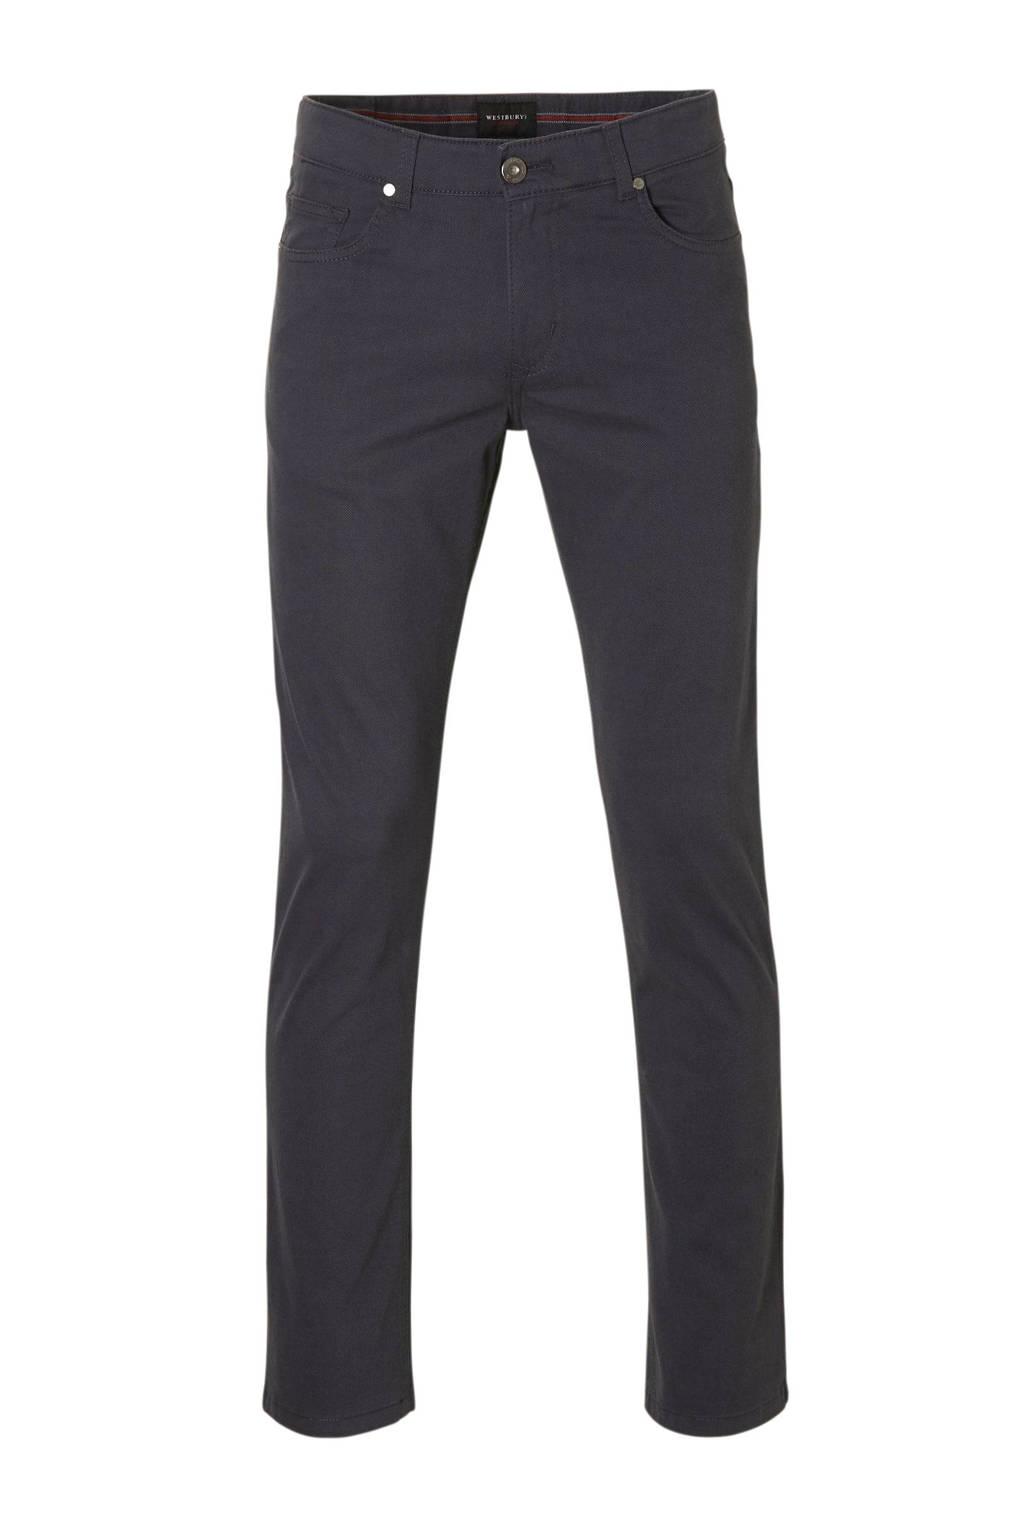 C&A Westbury 5 pocket broek, Blauw